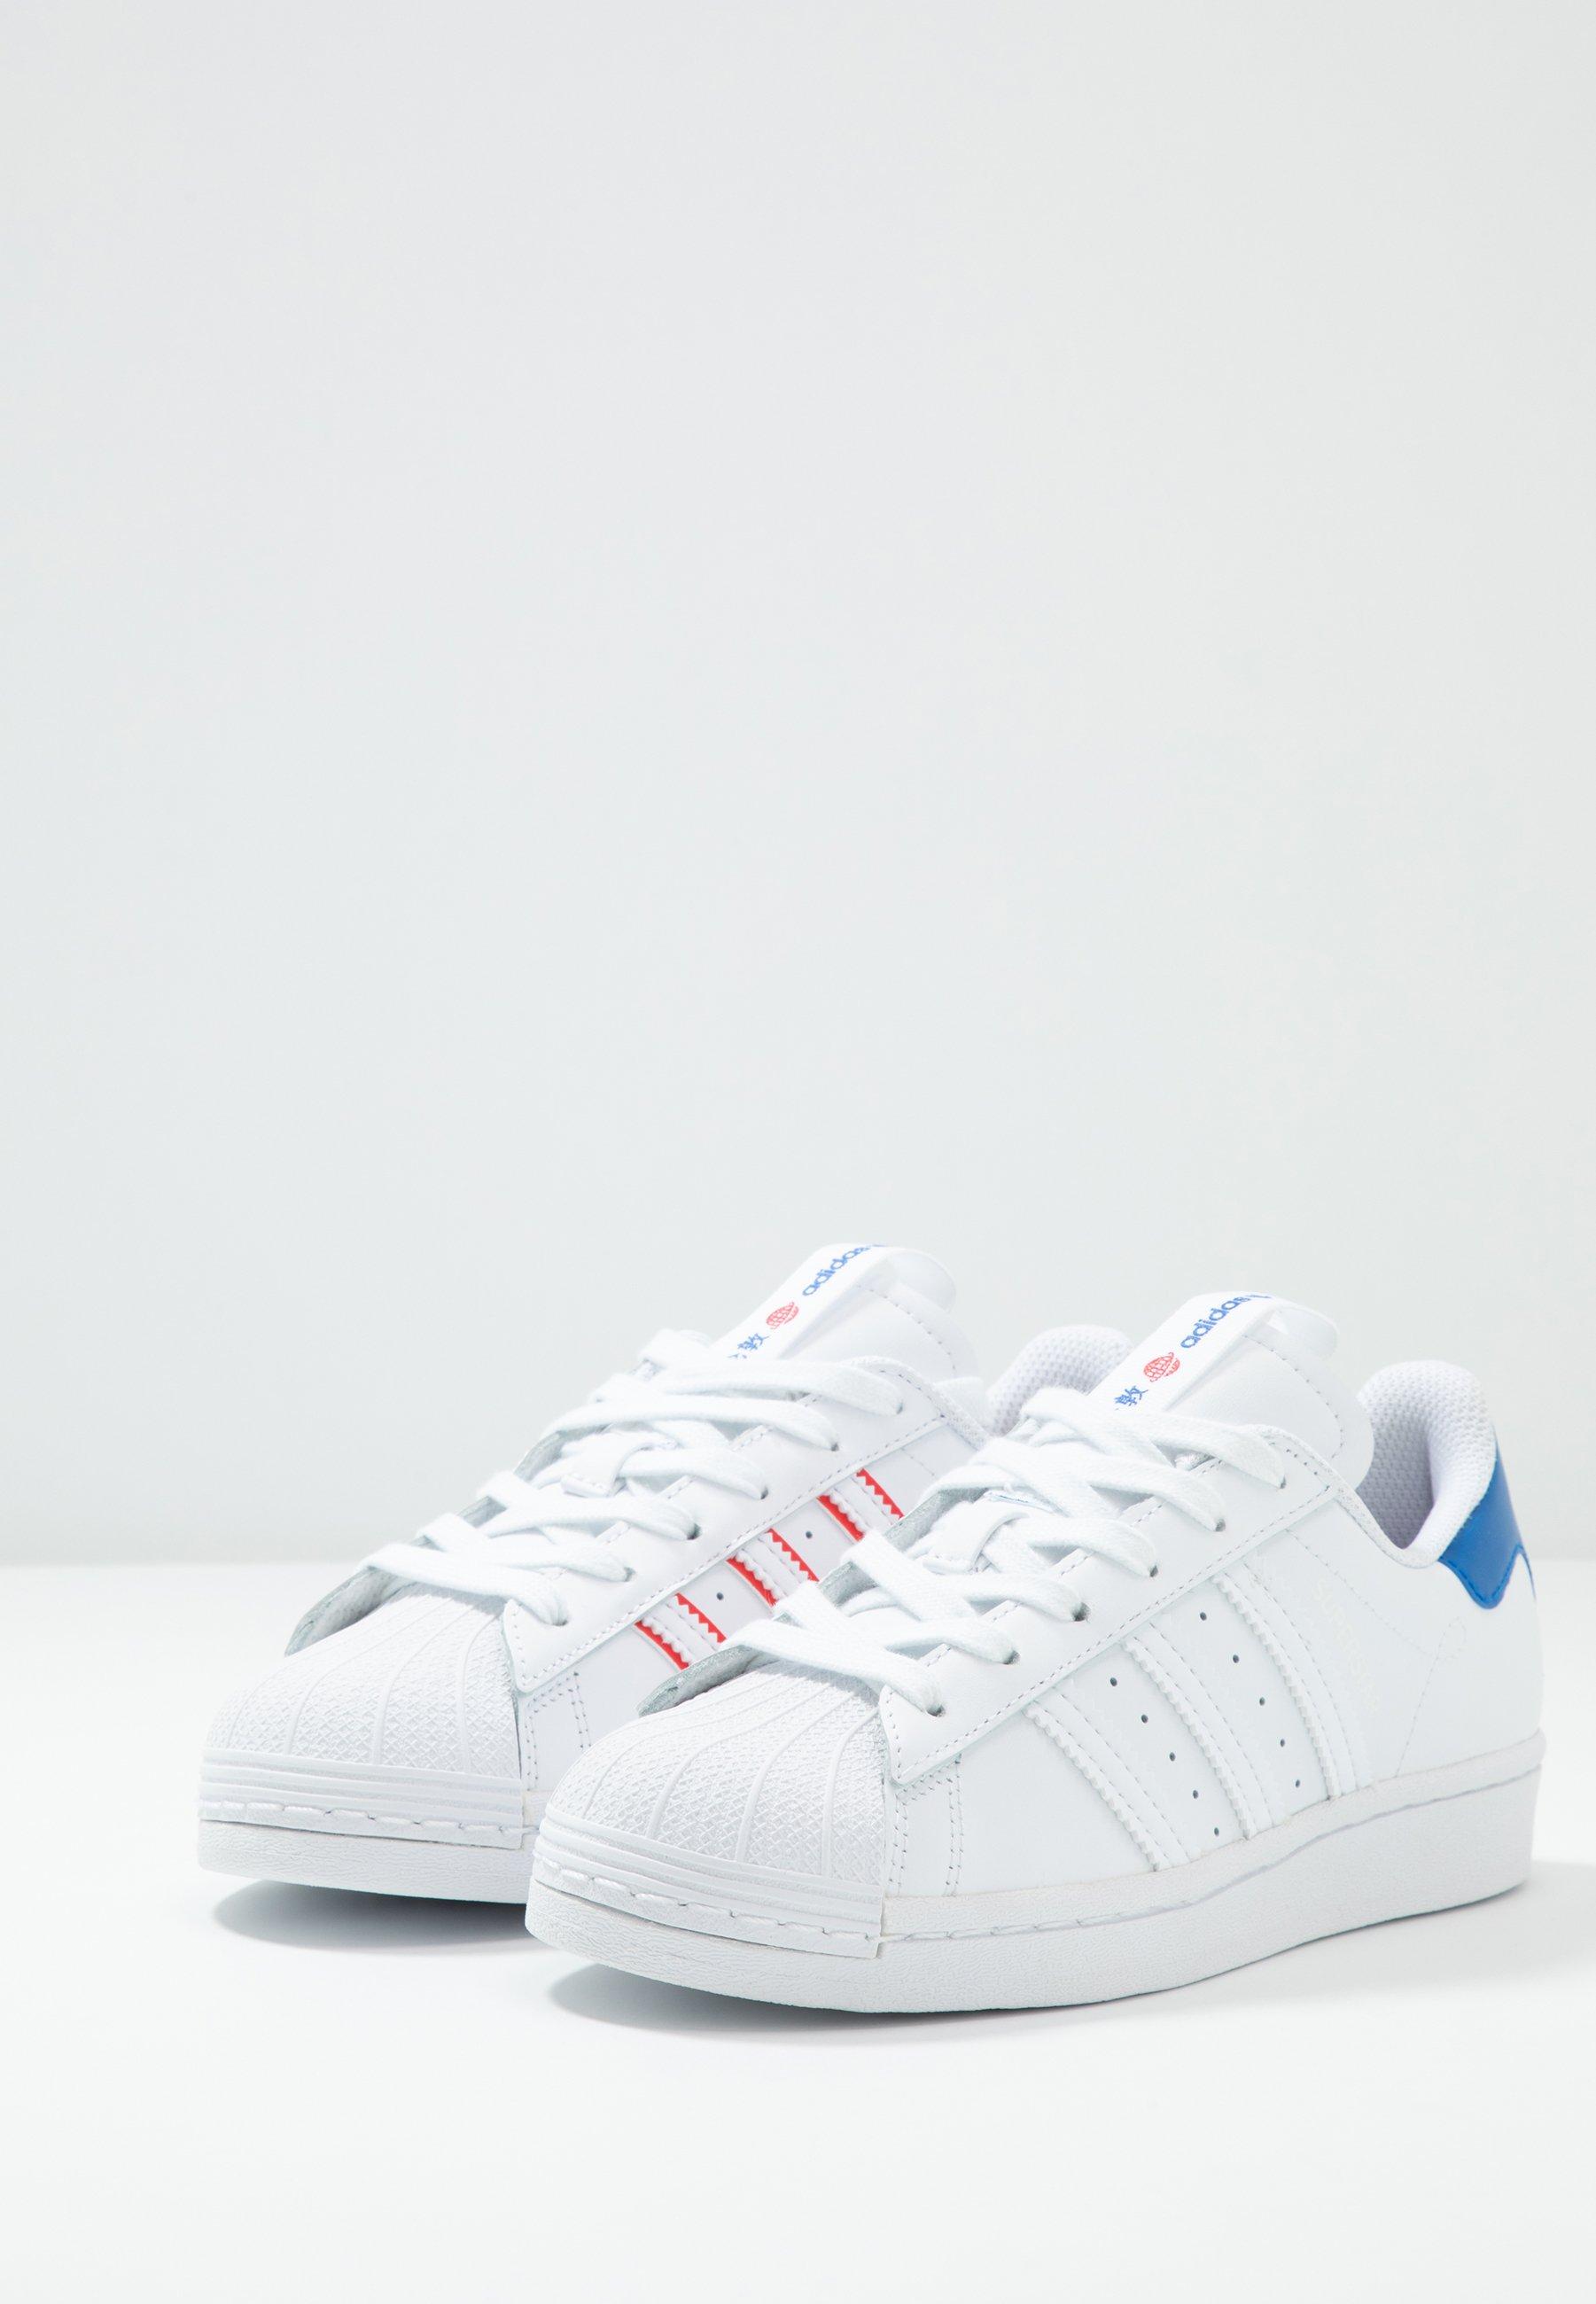 Geringster Preis adidas Originals SUPERSTAR - Sneaker low - footwear white/glow blue | Damenbekleidung 2020